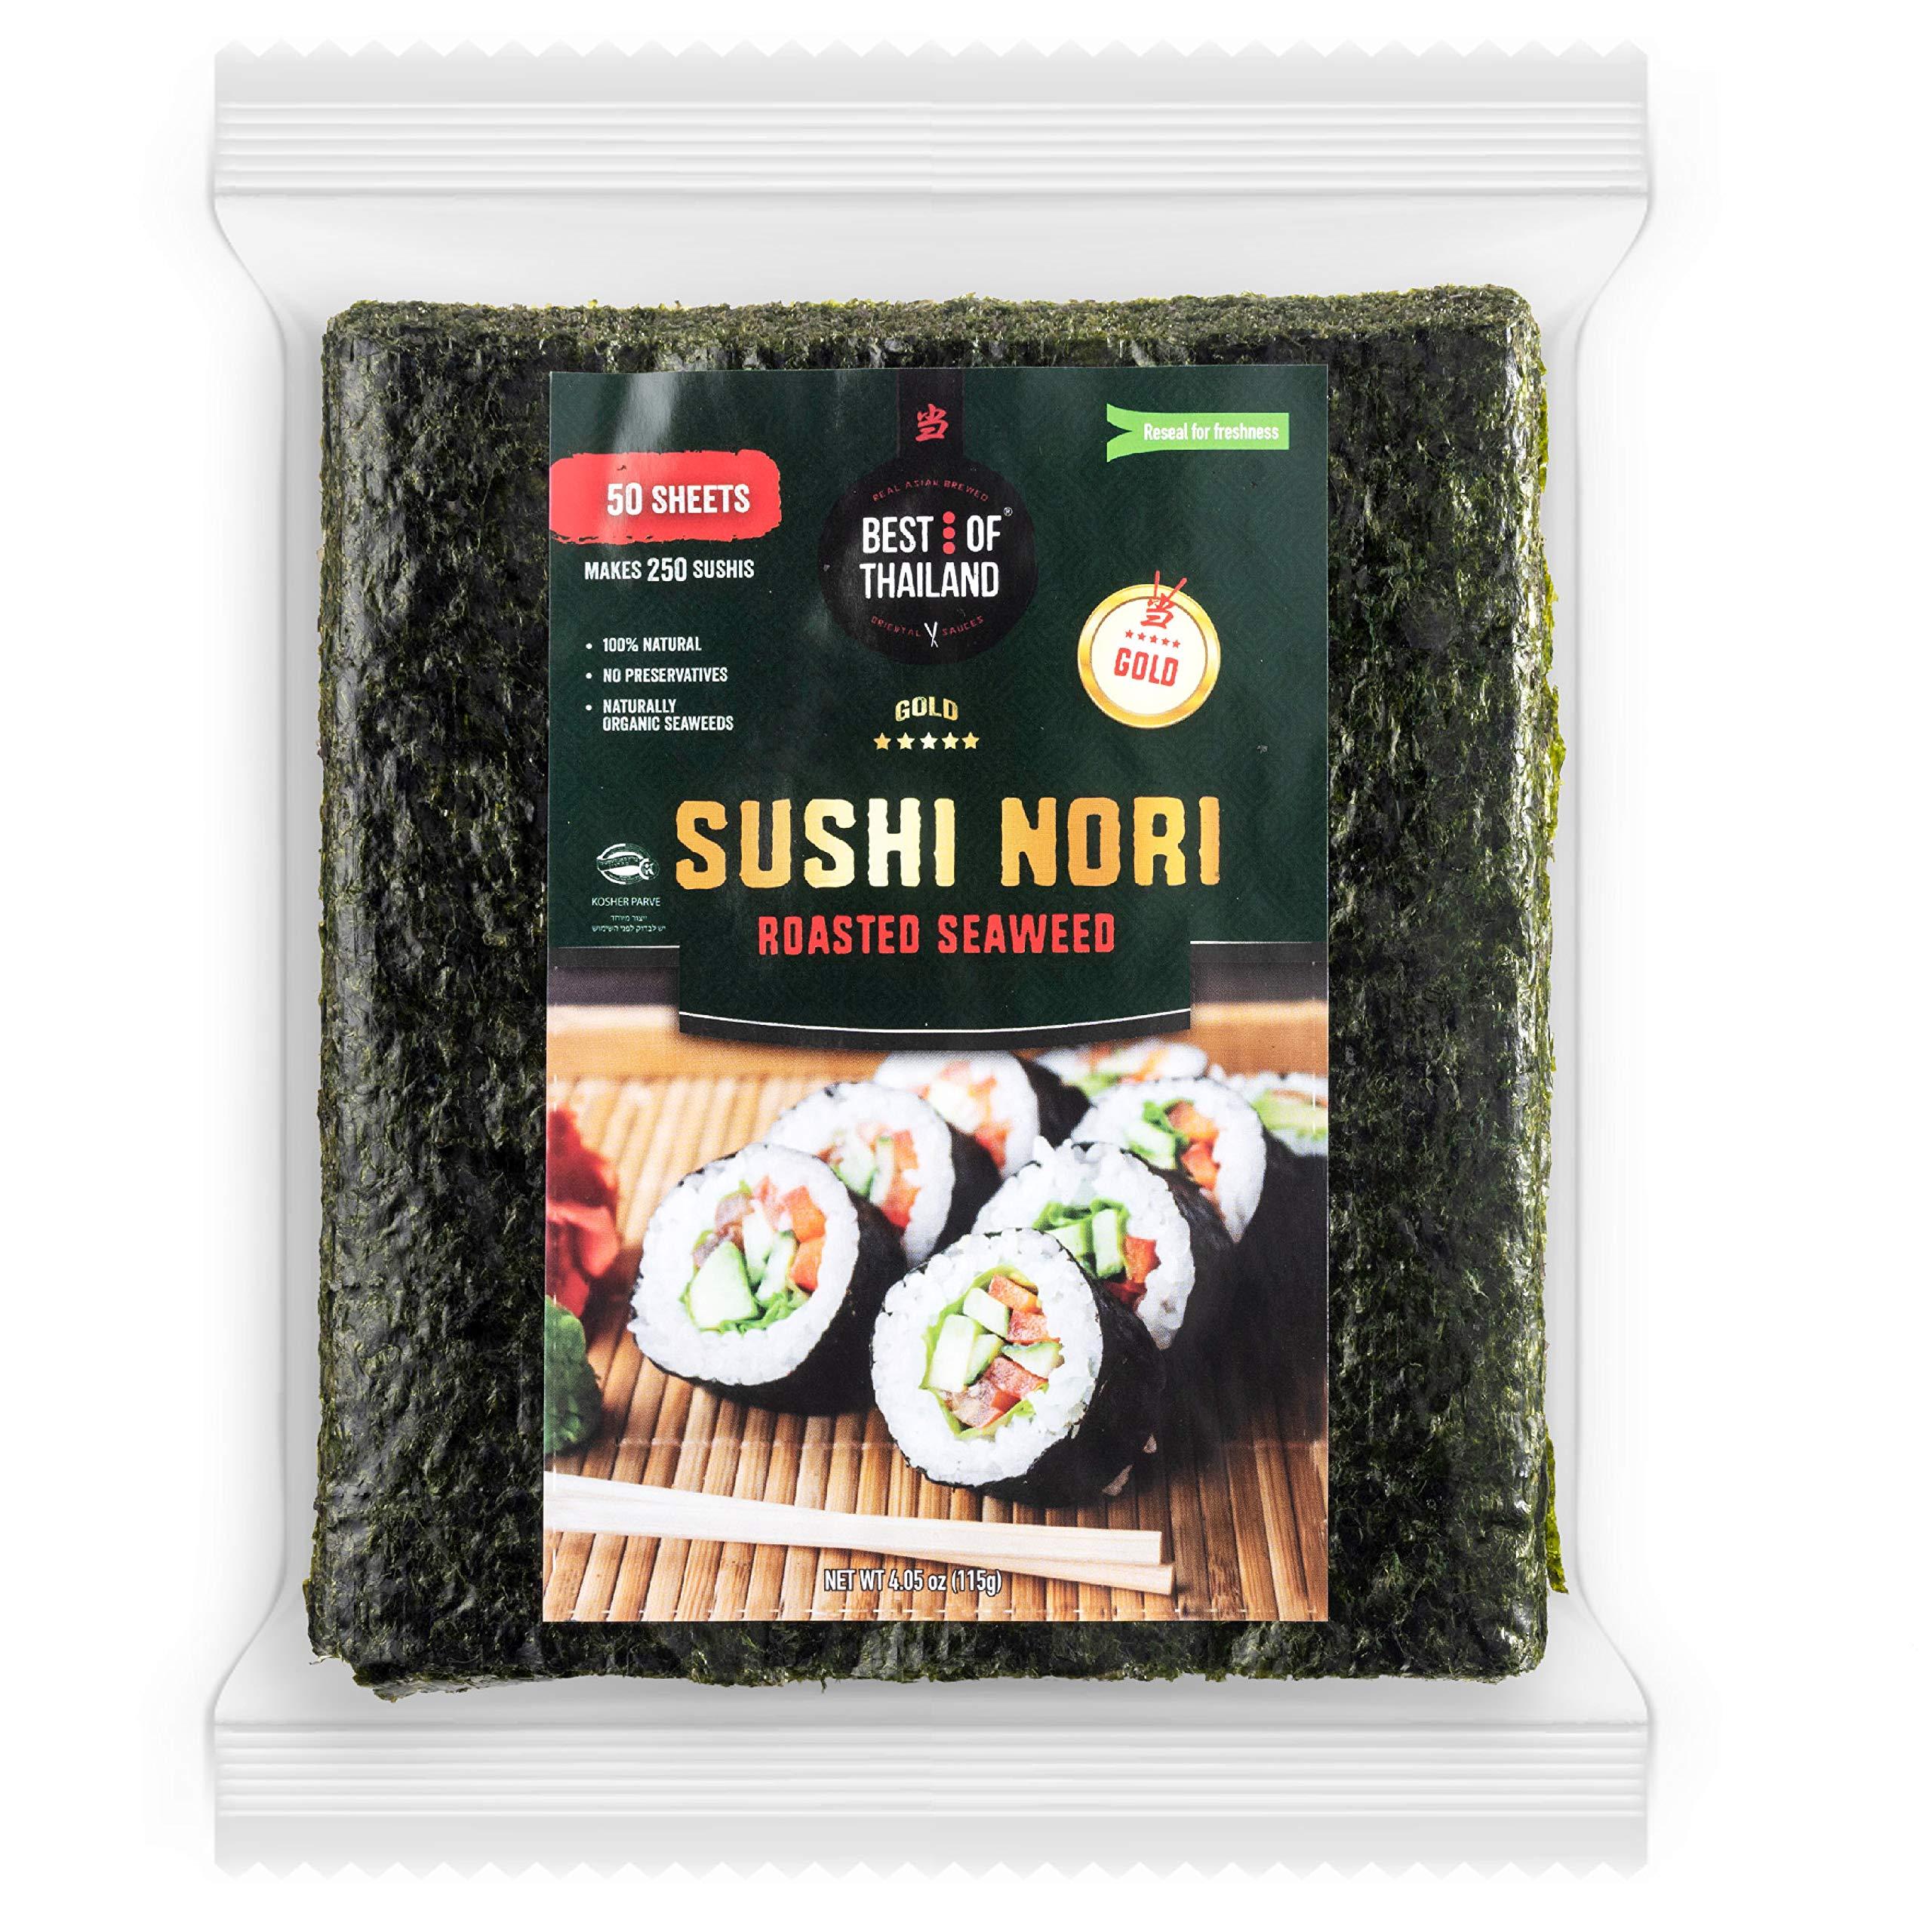 Best of Thailand Organic Sushi Nori Seaweed Sheets | Premium Roasted Kosher Korean Seaweed | Resealable Bulk Bag 50 Full Nori Sheets for Sushi | Non-GMO Vegan Dried Seaweed | All-Natural Keto-Friendly